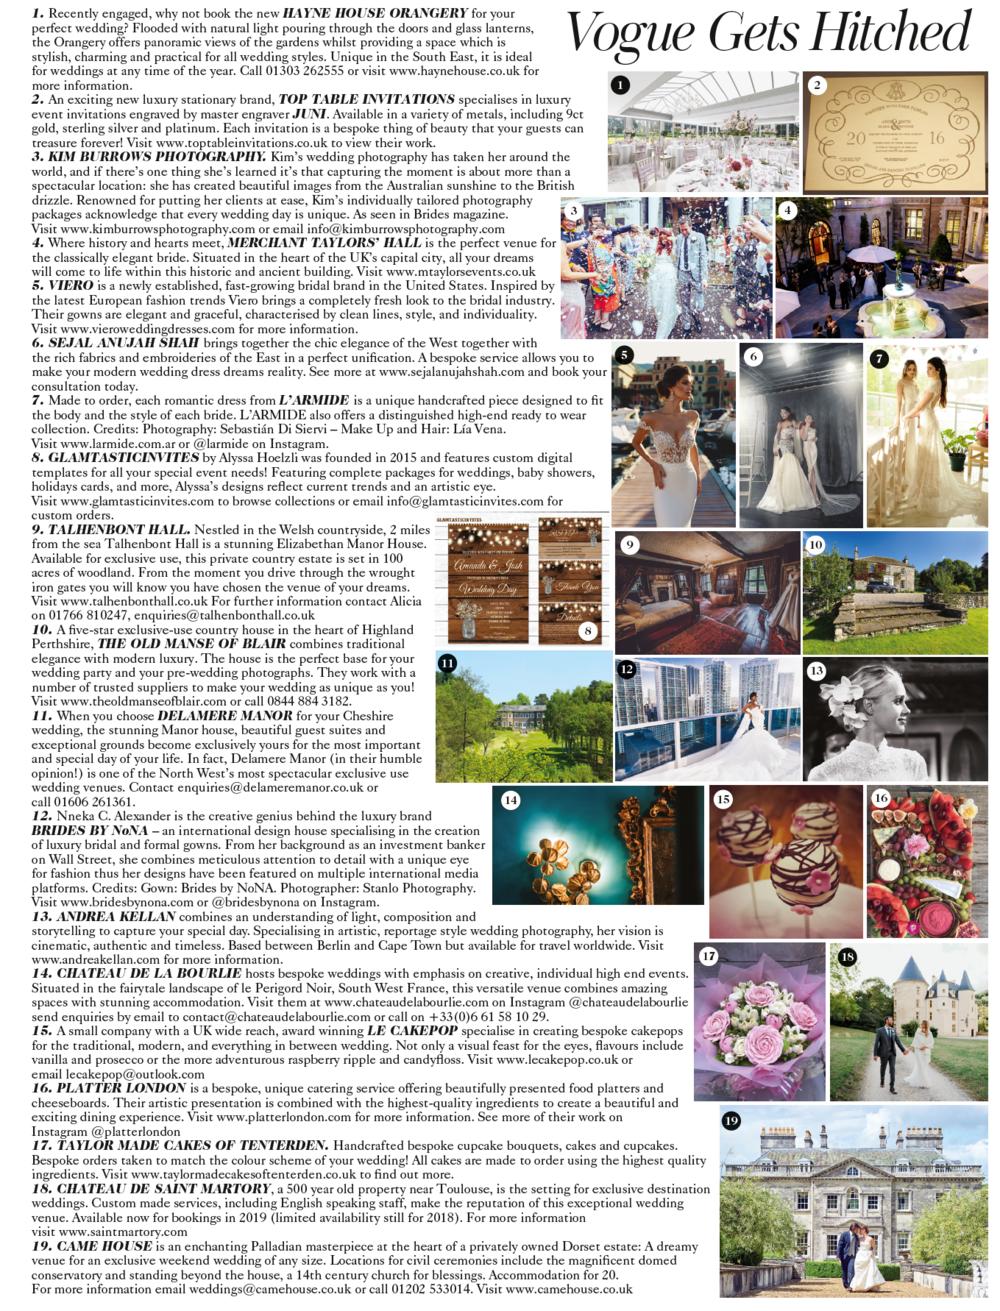 vogue wedding photographer andrea kellan